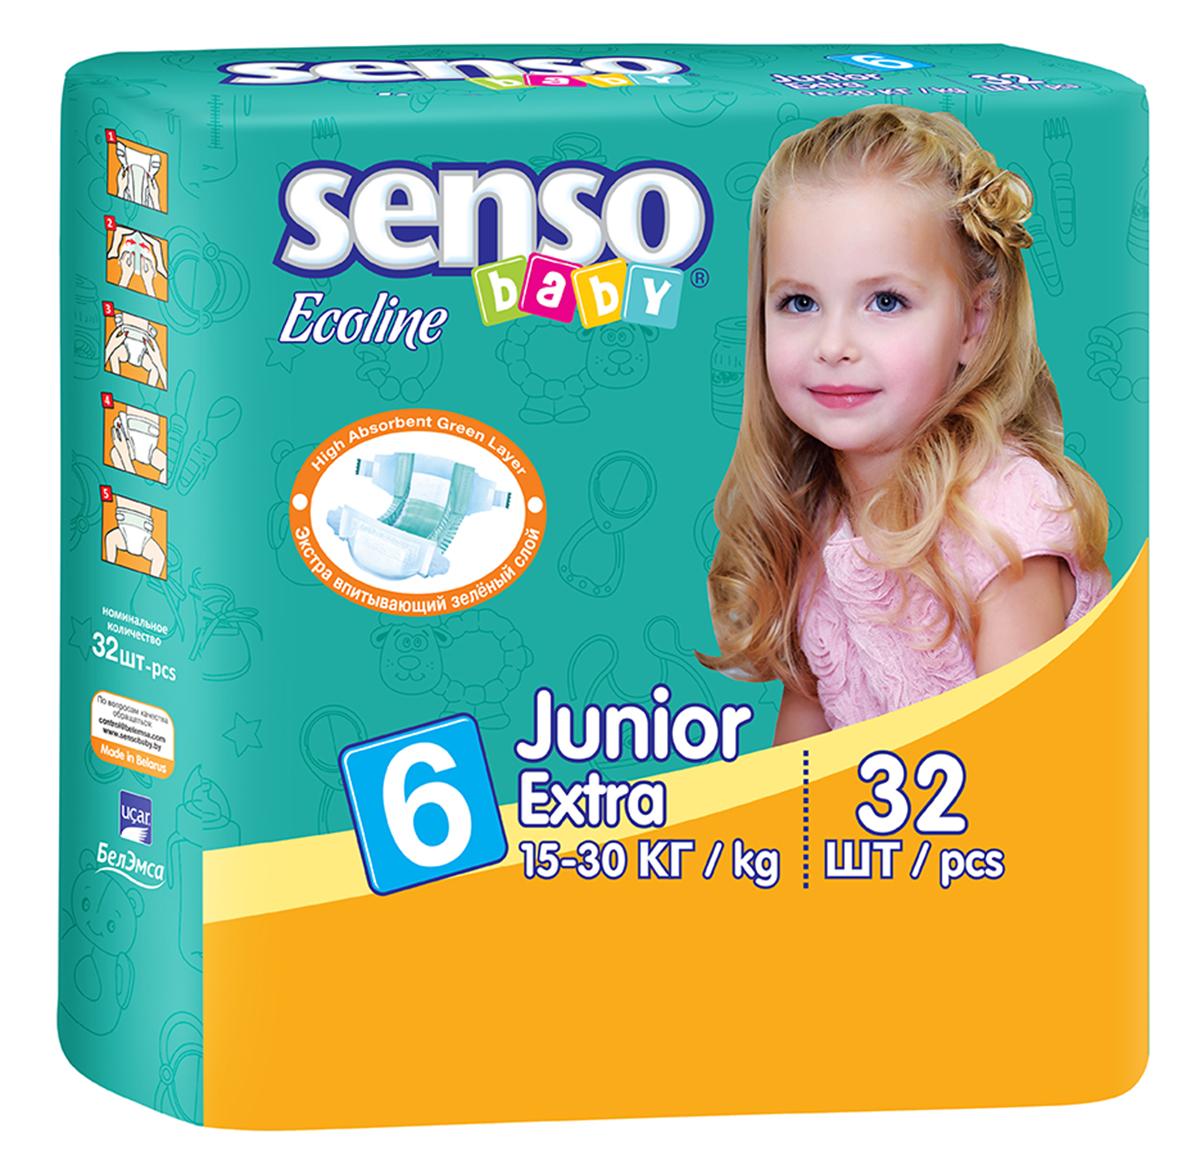 Senso Baby Ecoline Подгузники детские Junior Extra 15-30 кг 32 шт300088